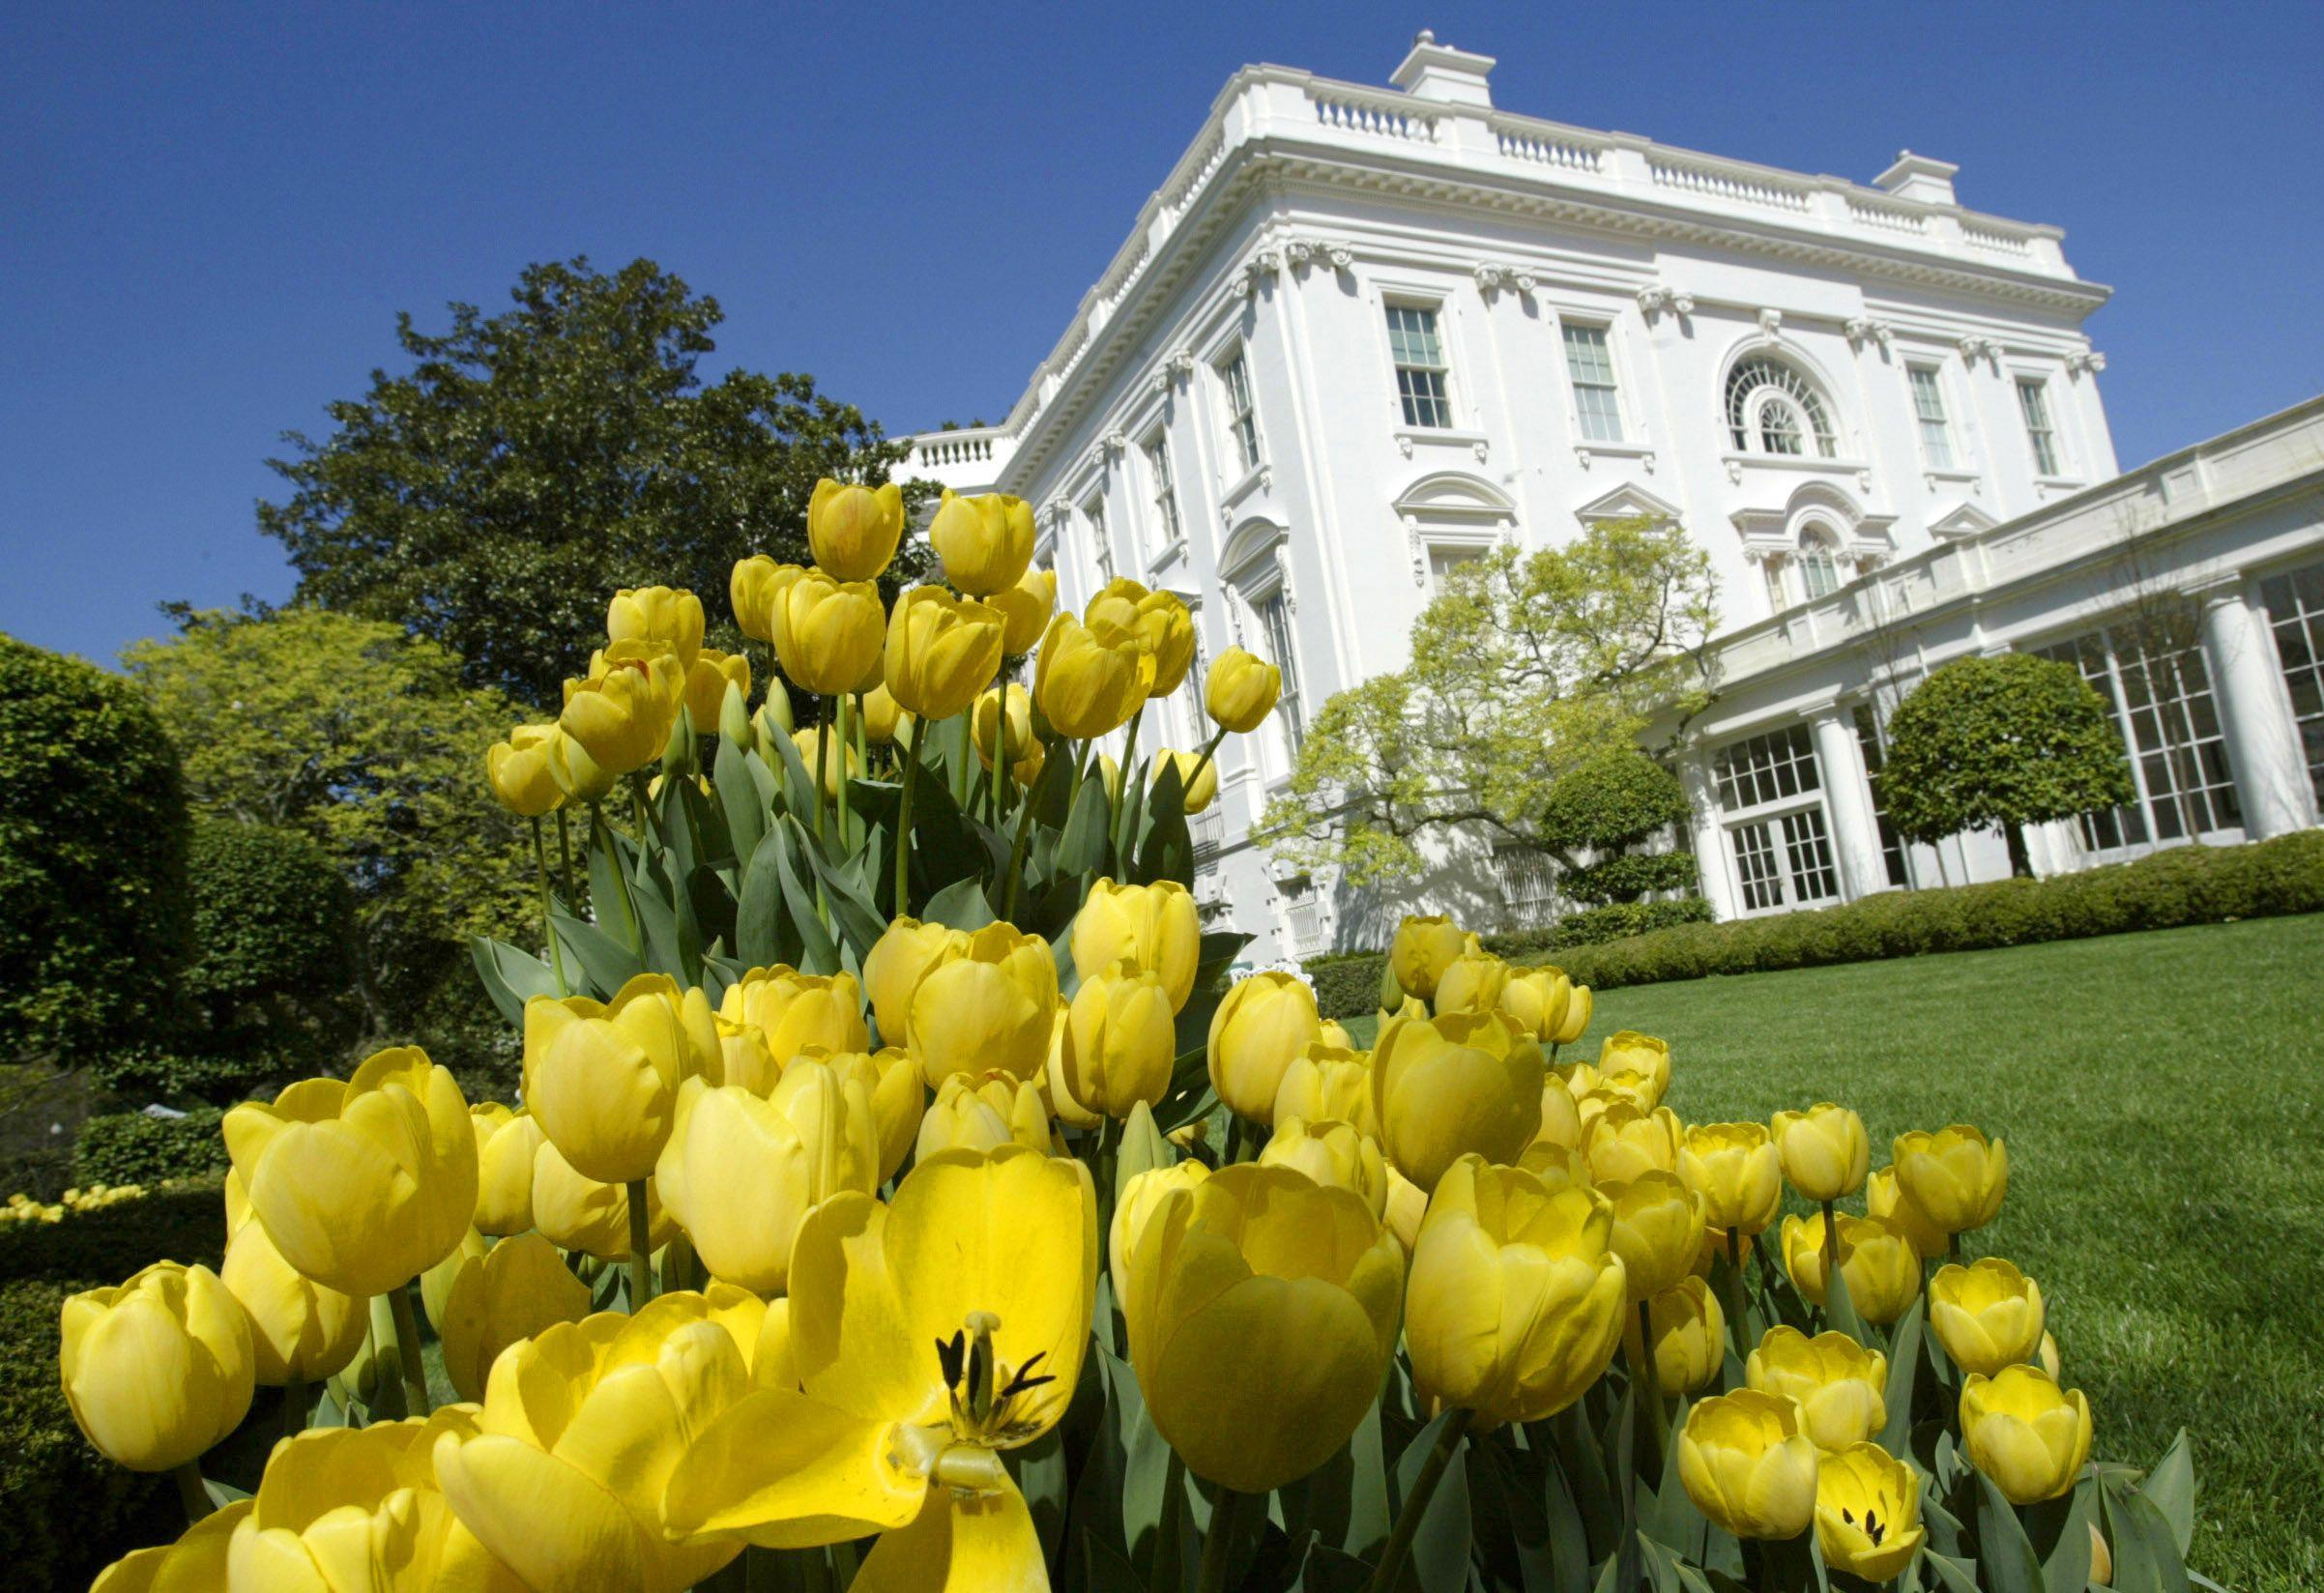 White House to Host Fall Garden Tours October 17, 18